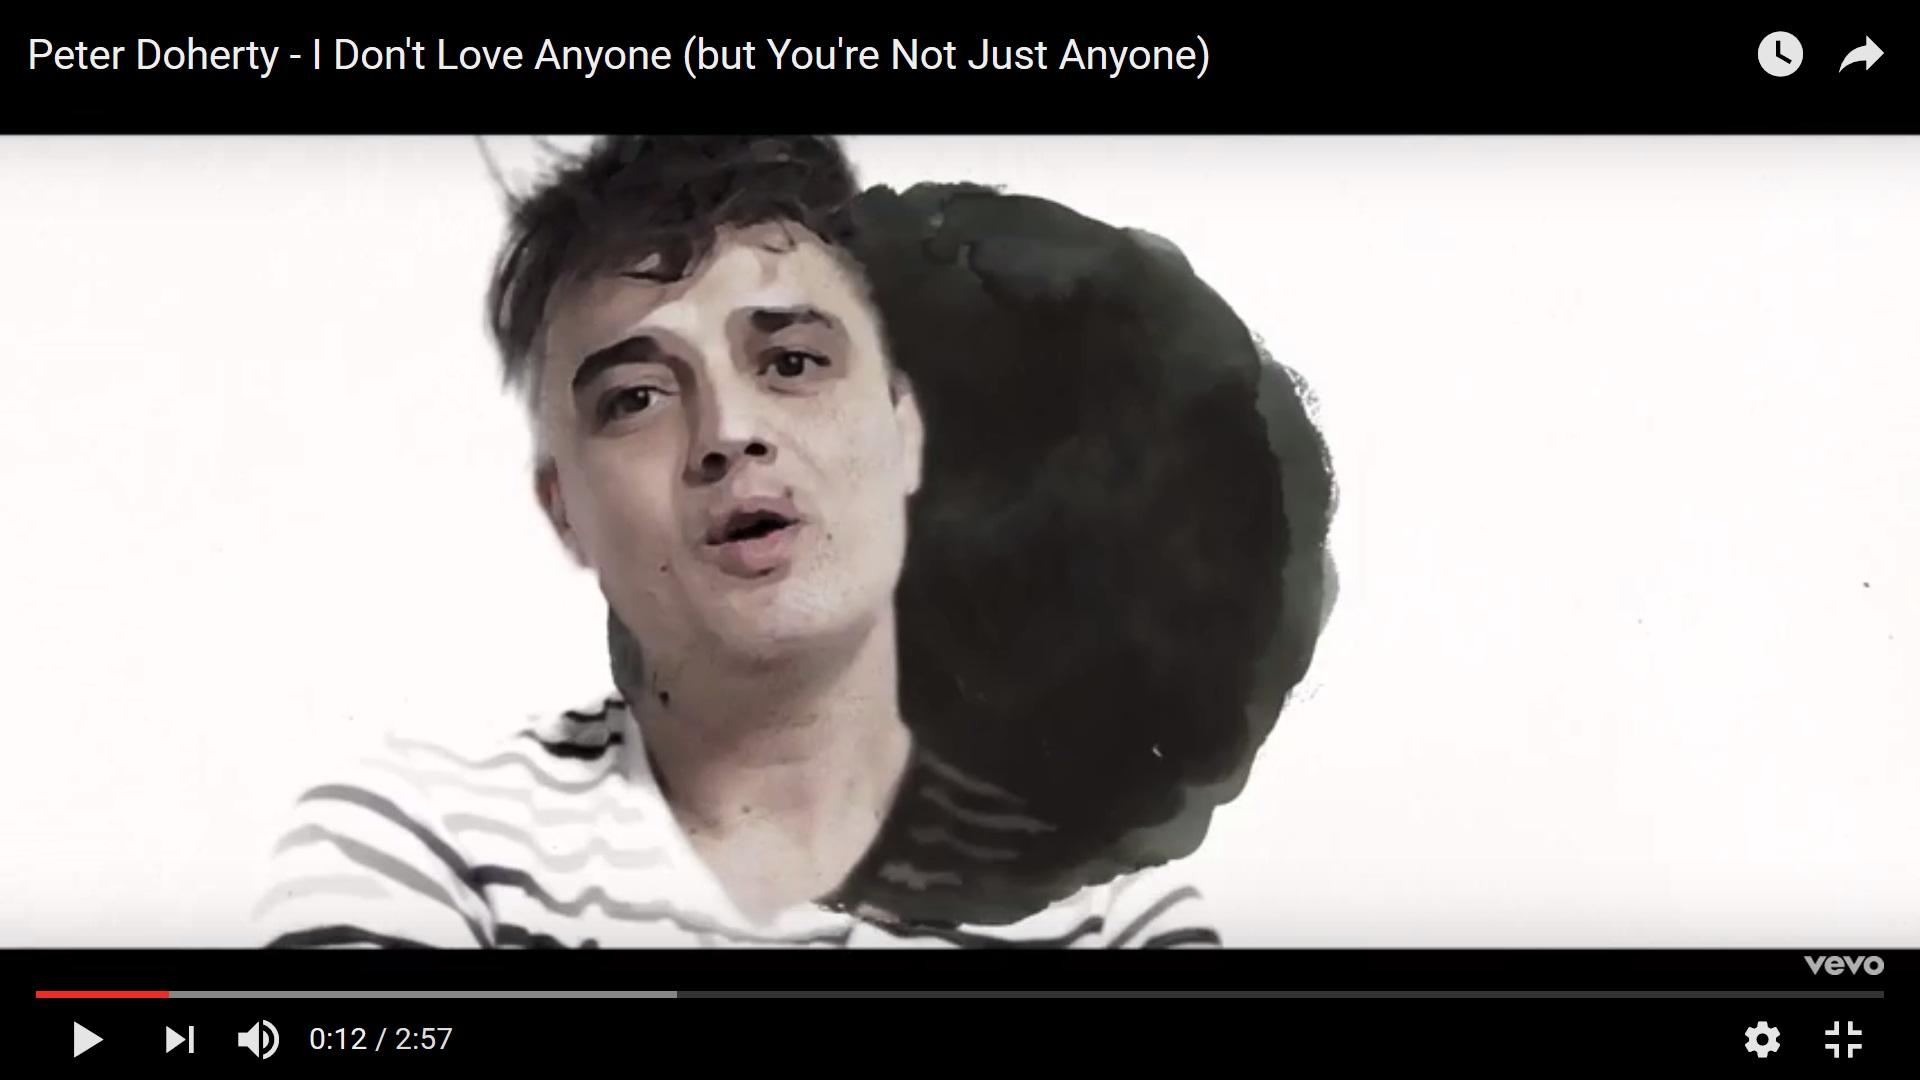 Пит Доэрти выпустил клип на песню I Don't Love Anyone (But You're Not Just Anyone)